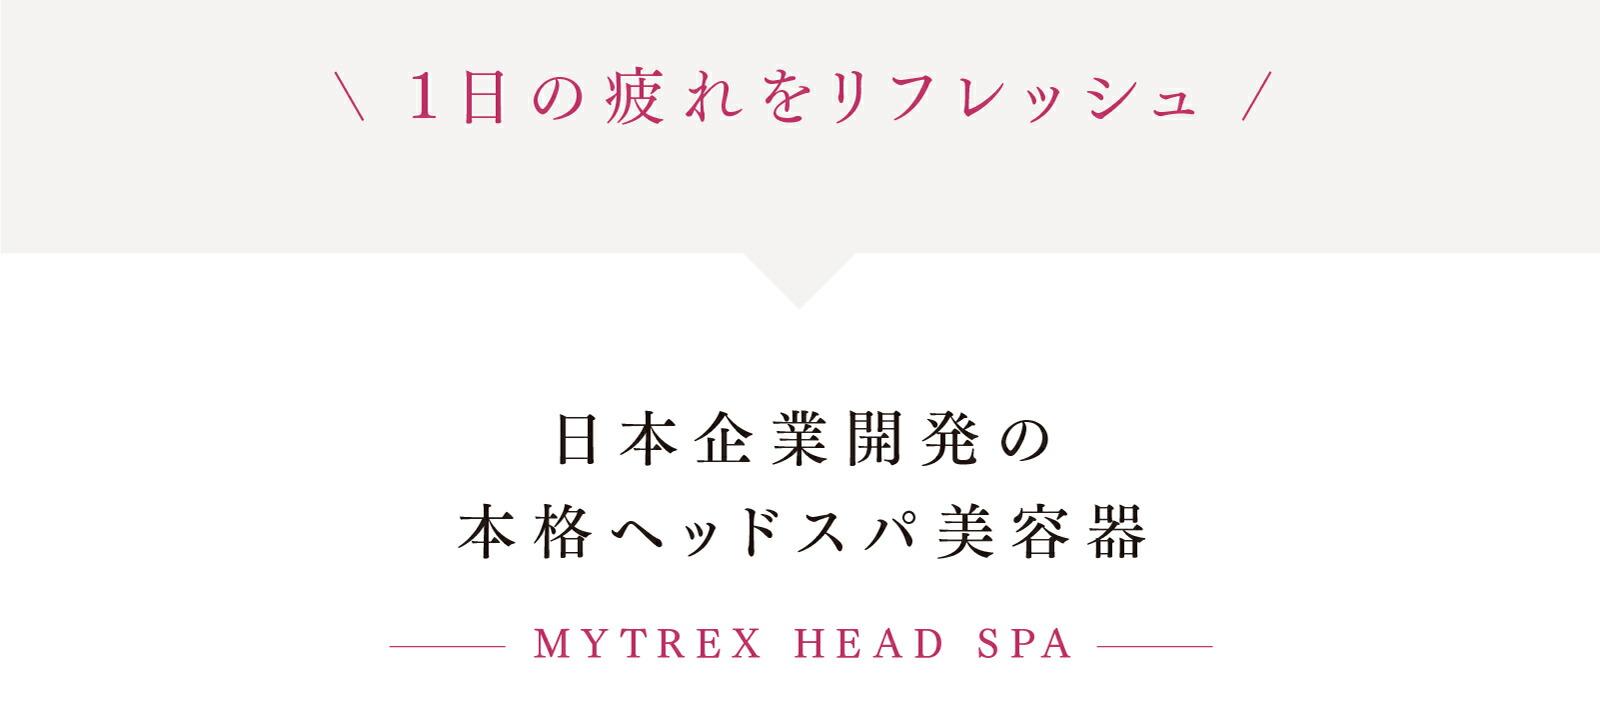 MYTREX HEAD SPA マイトレックス ヘッドスパ